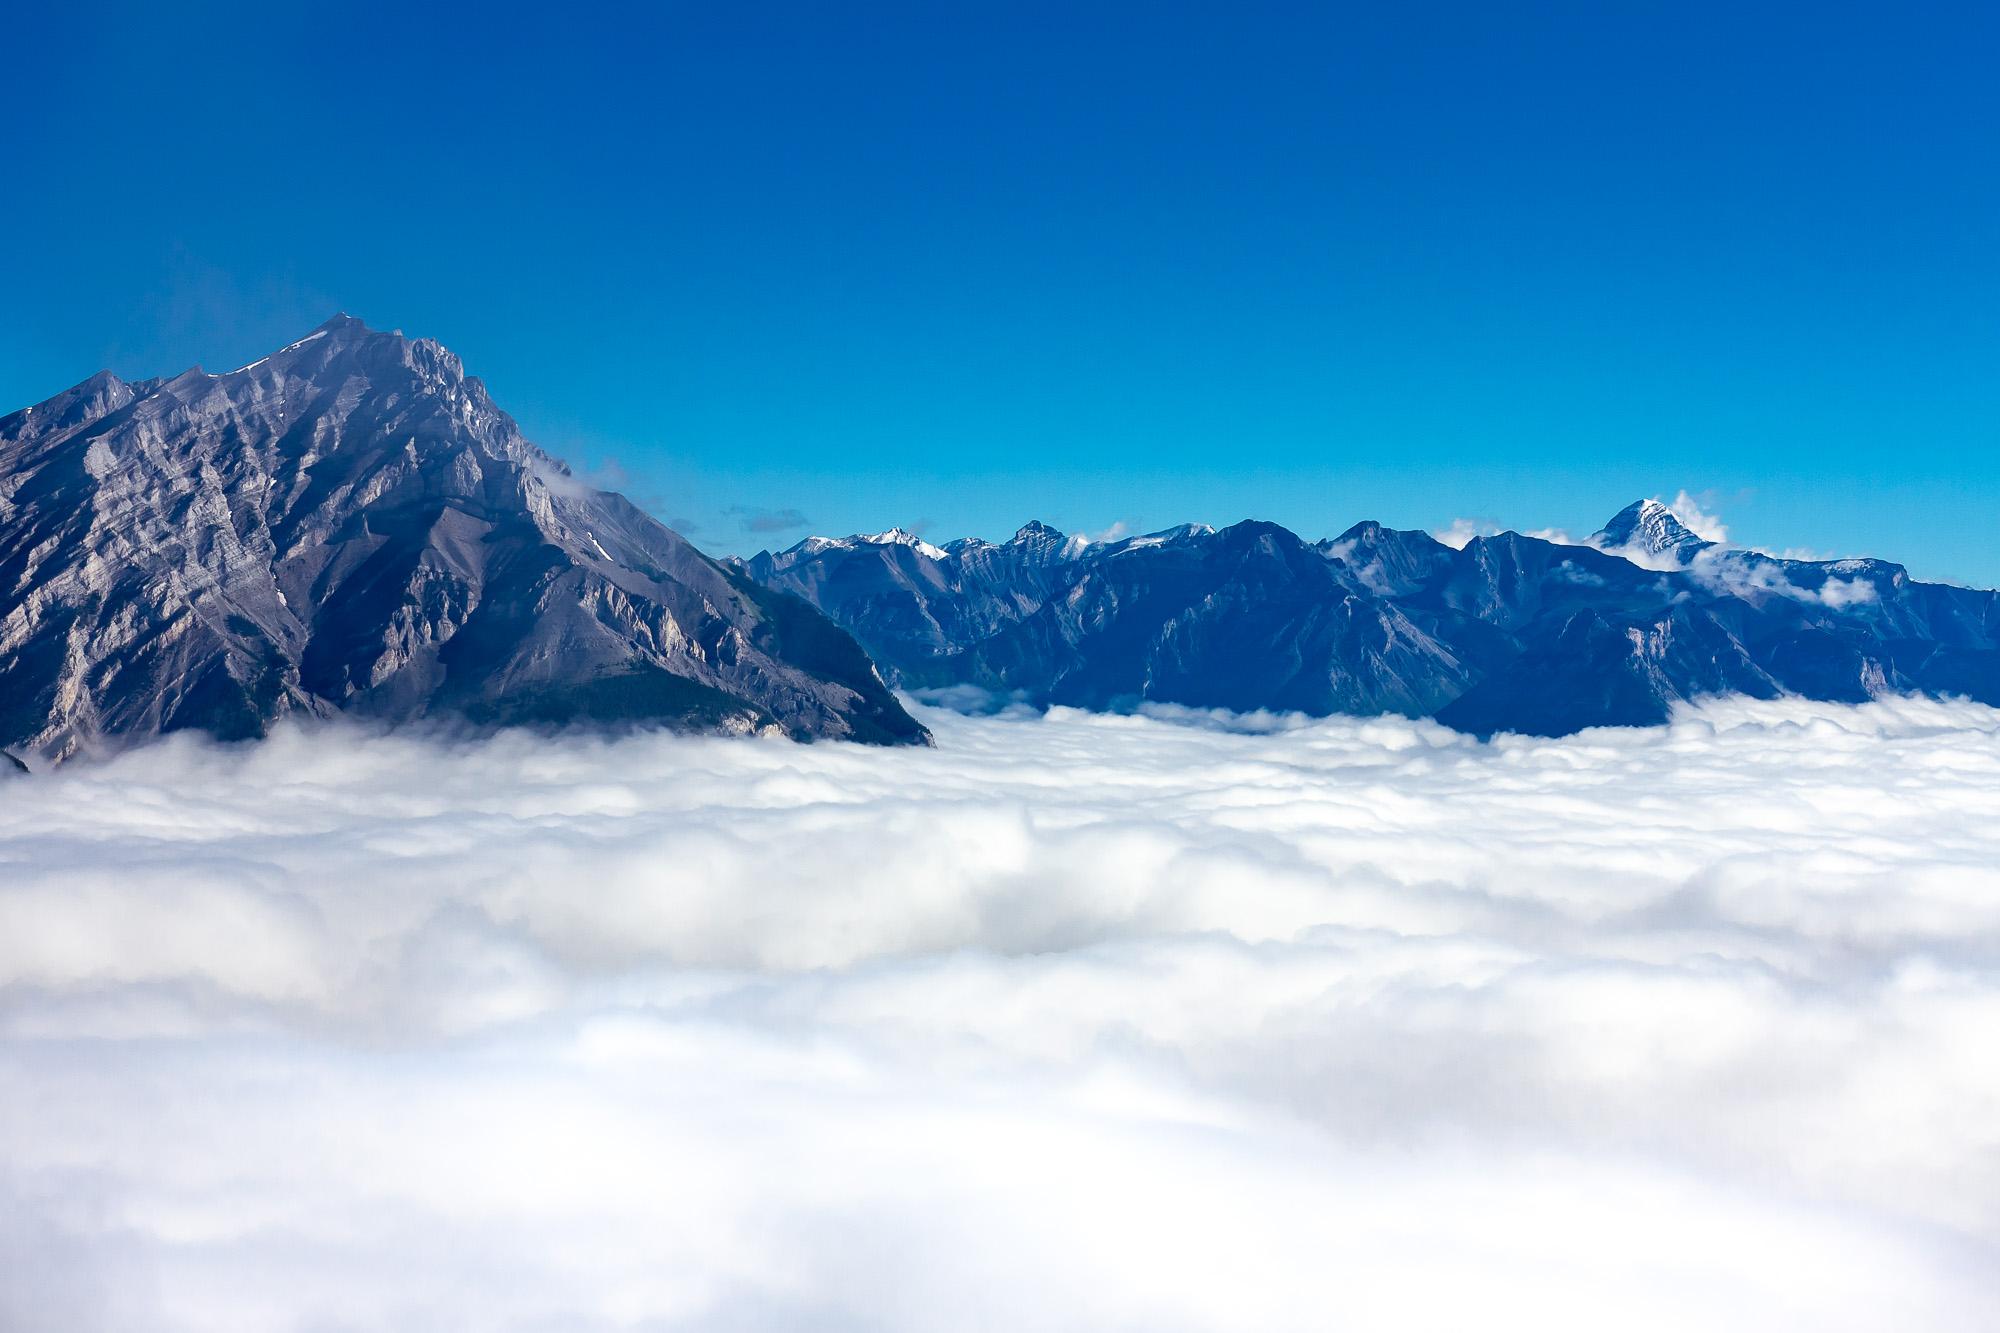 Banff, Canadian Rockies - Sulphur Mountain